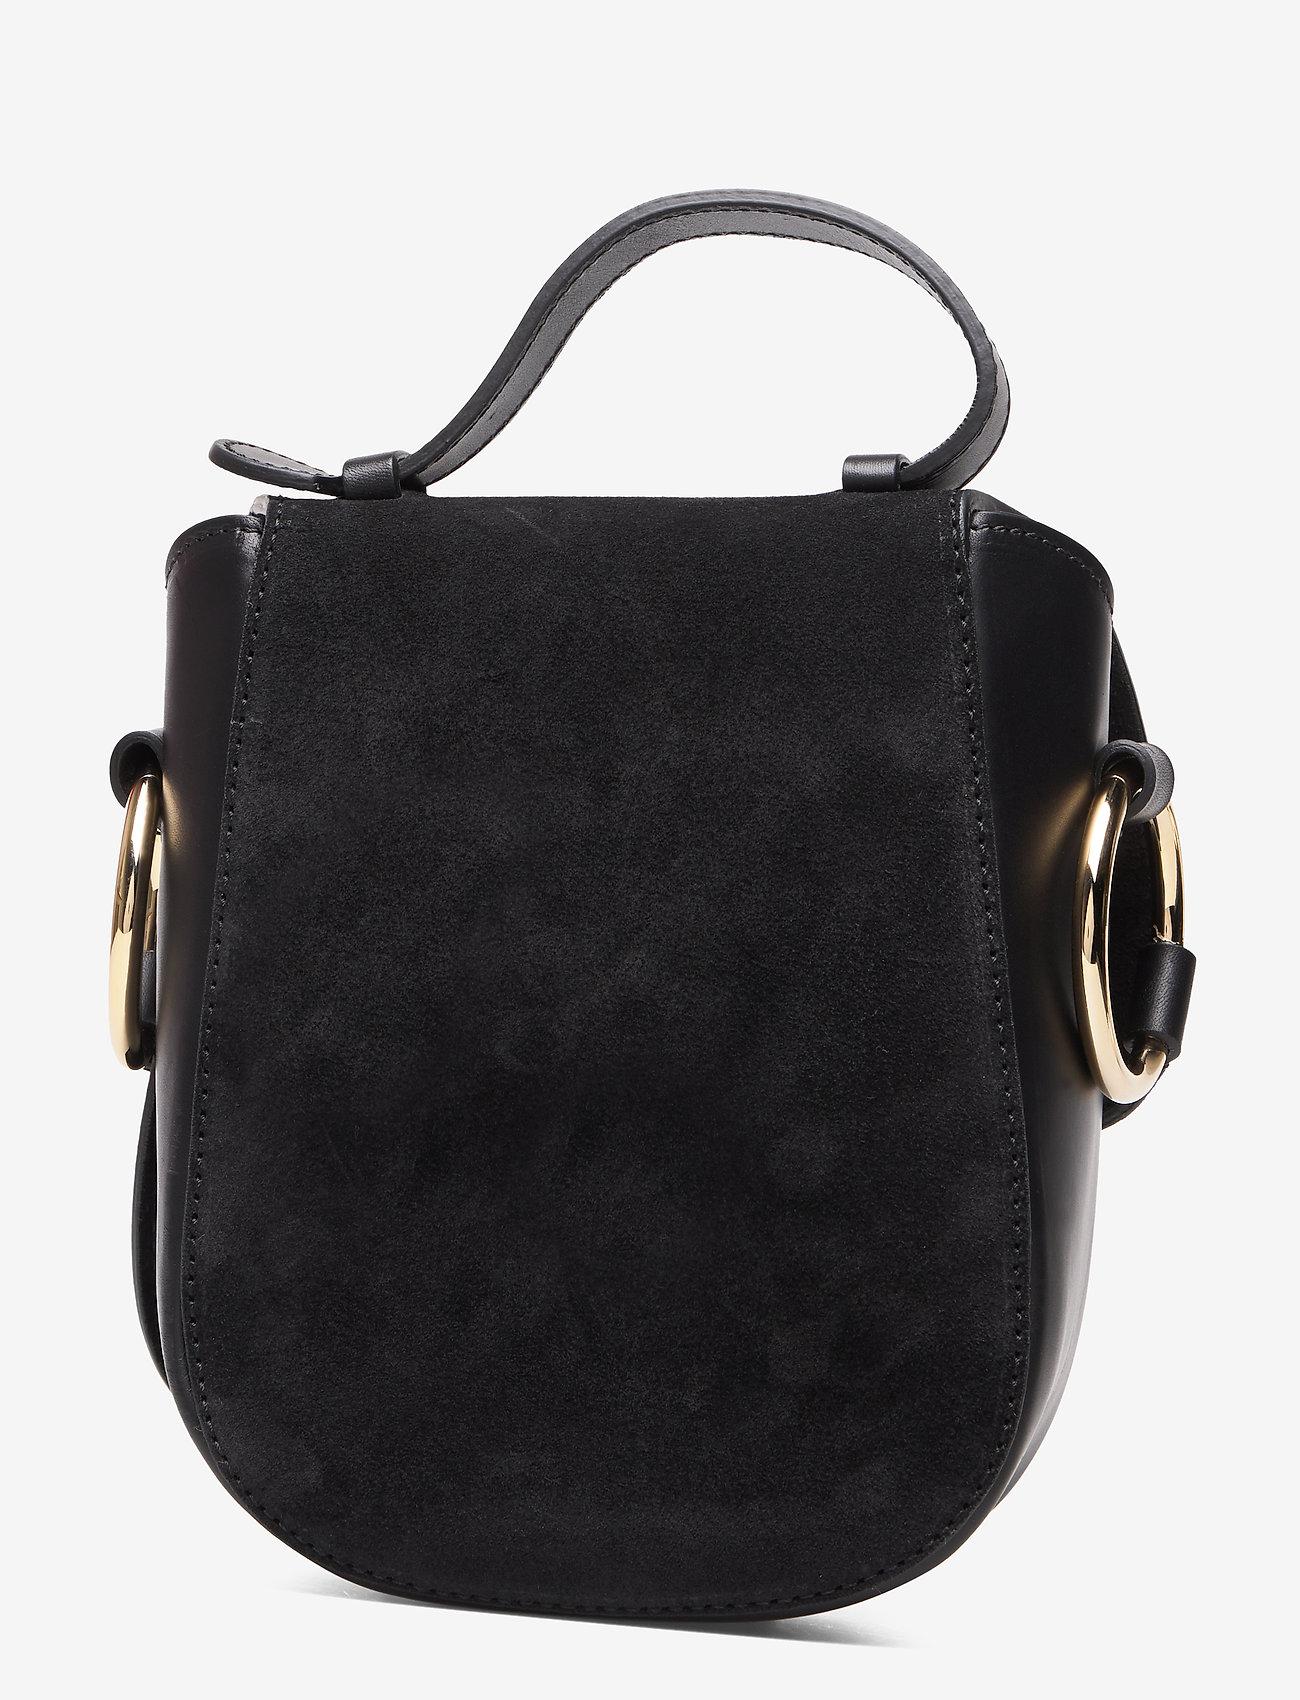 ATP Atelier - Carrara Black Suede/Vacchetta - shoulder bags - black - 1